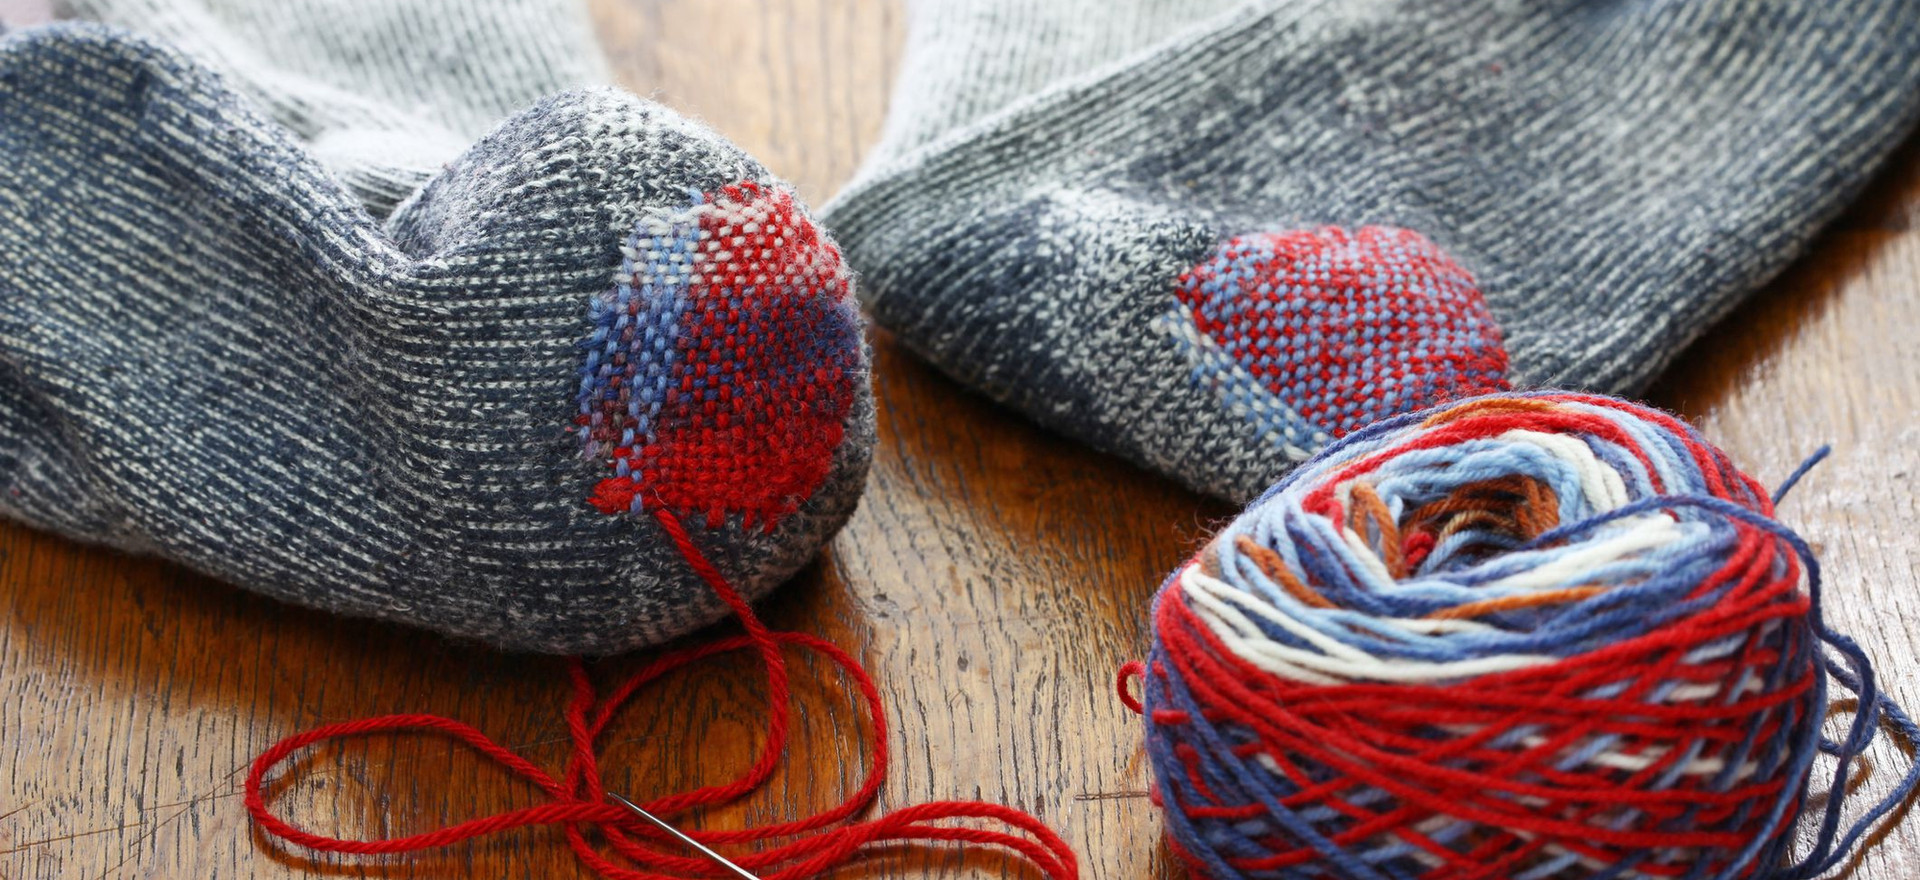 Darning Socks workshop